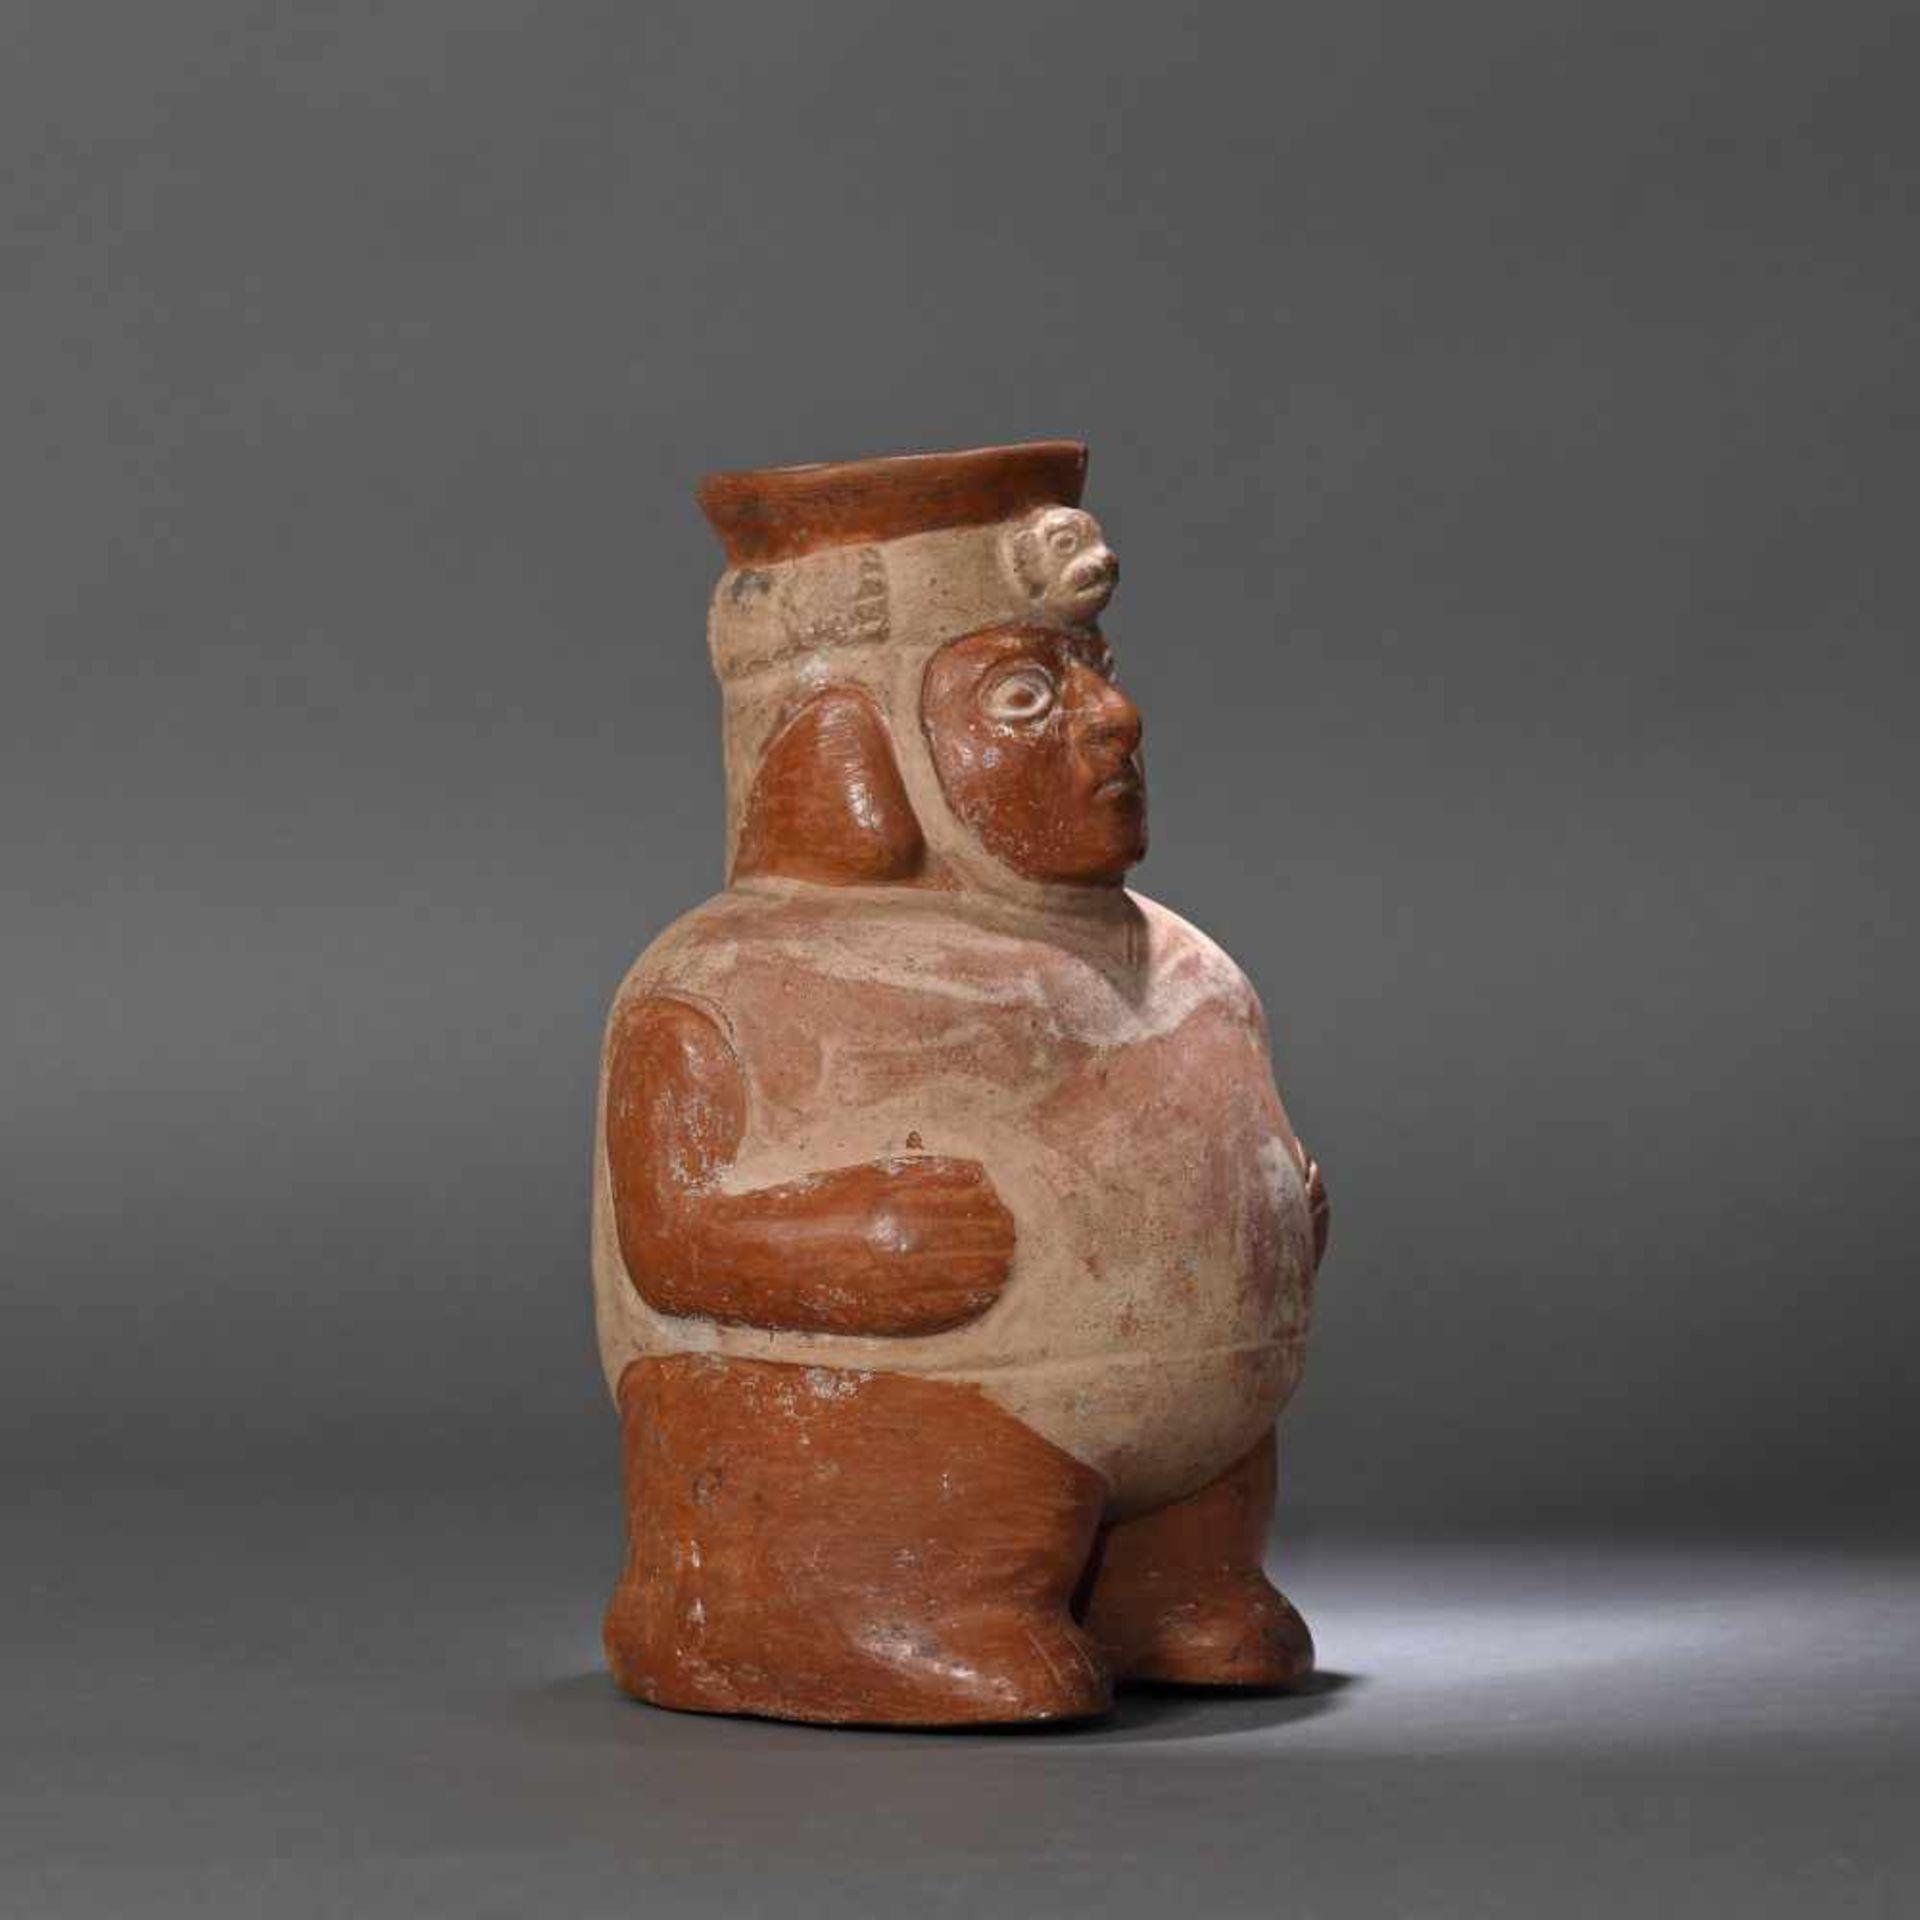 Painted ceramic vessel, illustrating a man, Moche culture, Peru, approx. 1,200 years old, 9th centur - Bild 3 aus 6